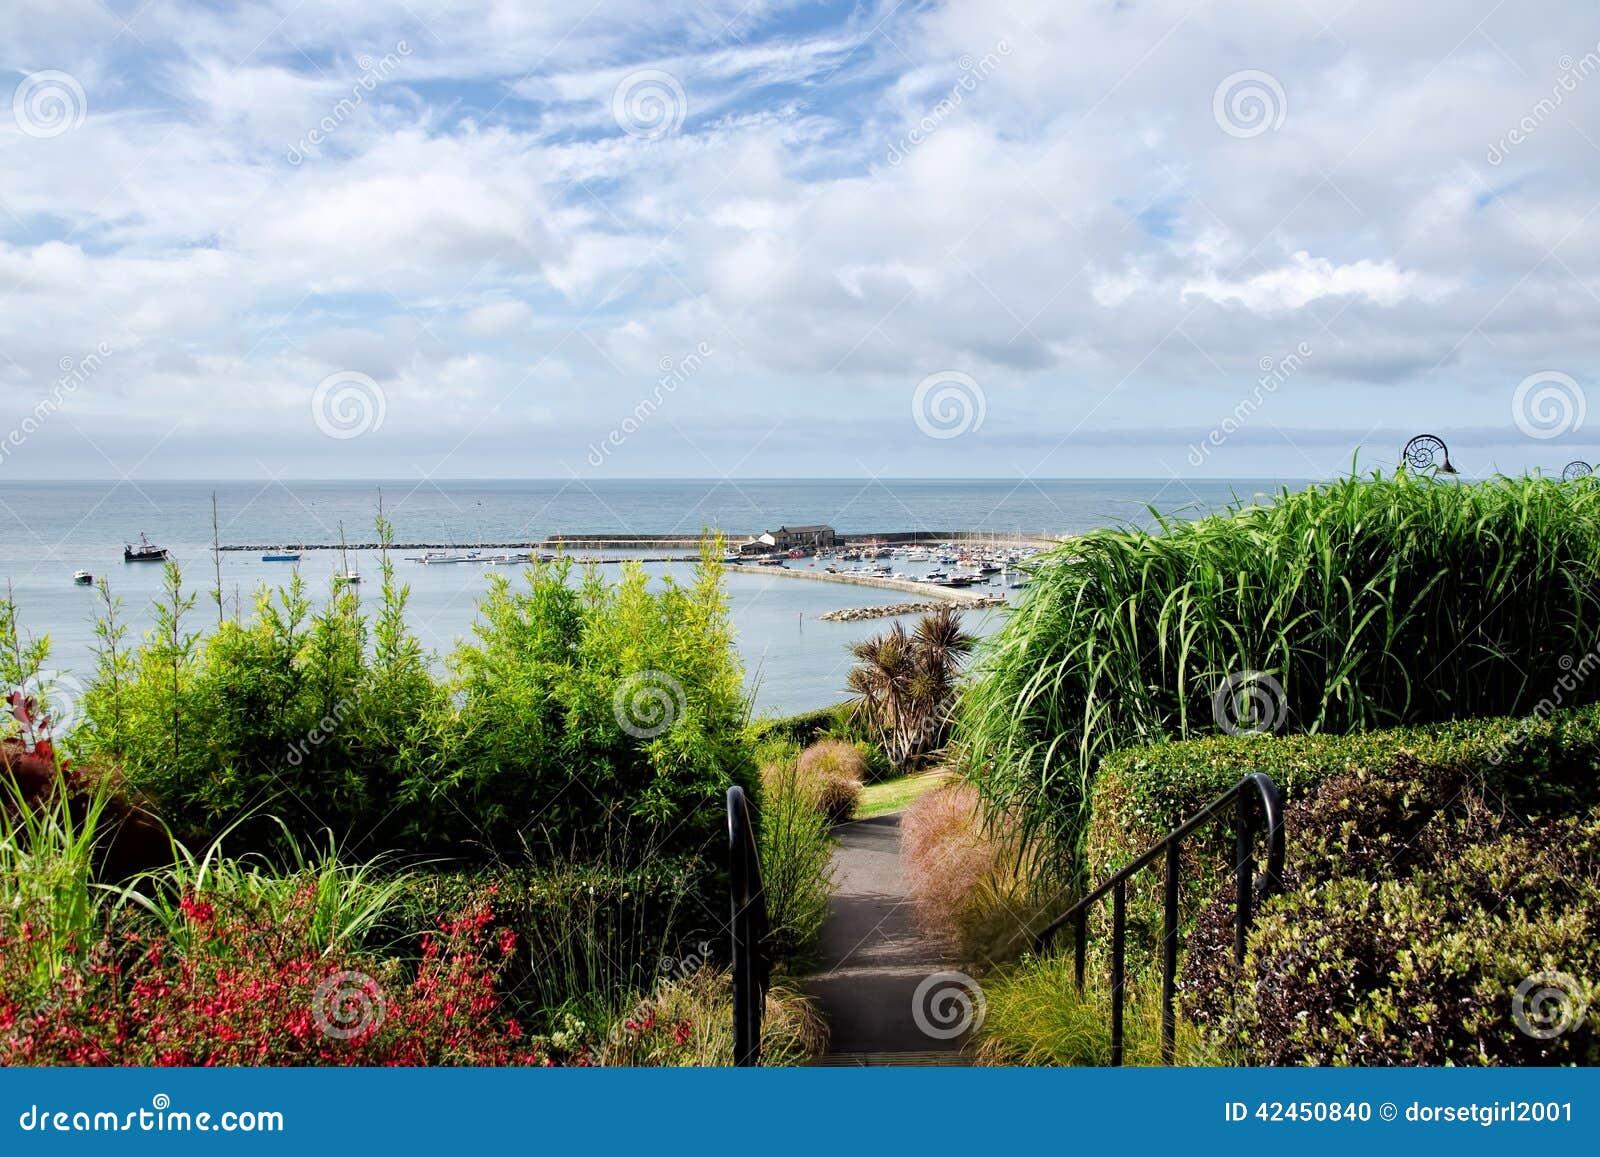 Lyme Regis Overview